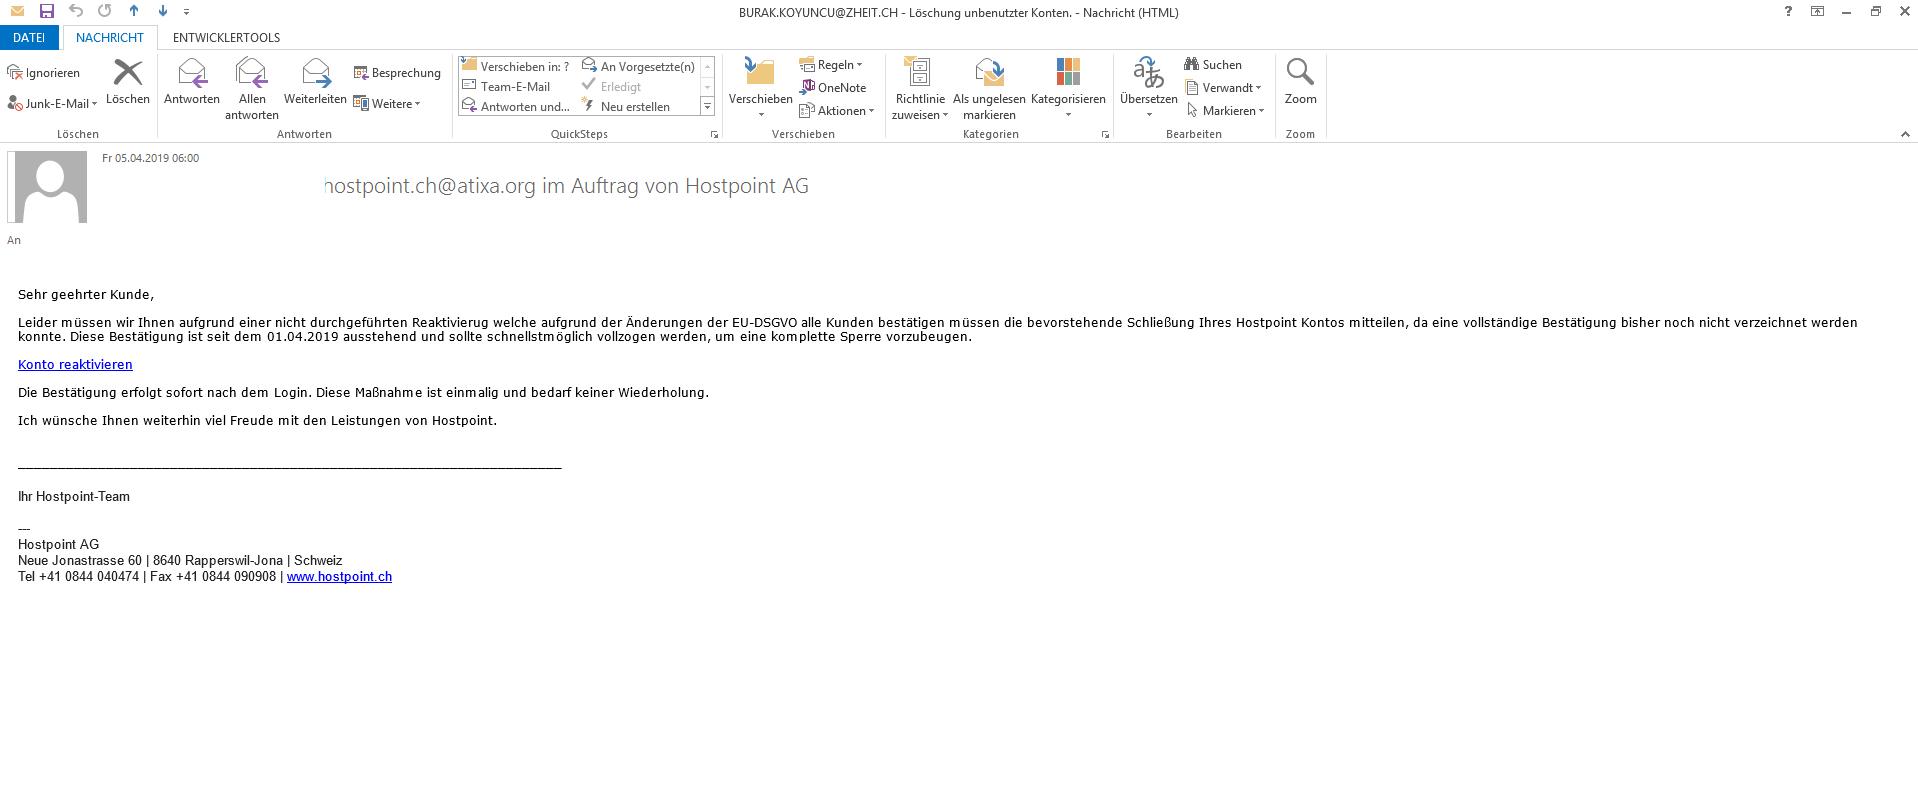 Hostpoint Phishing-Emails im Umlauf!